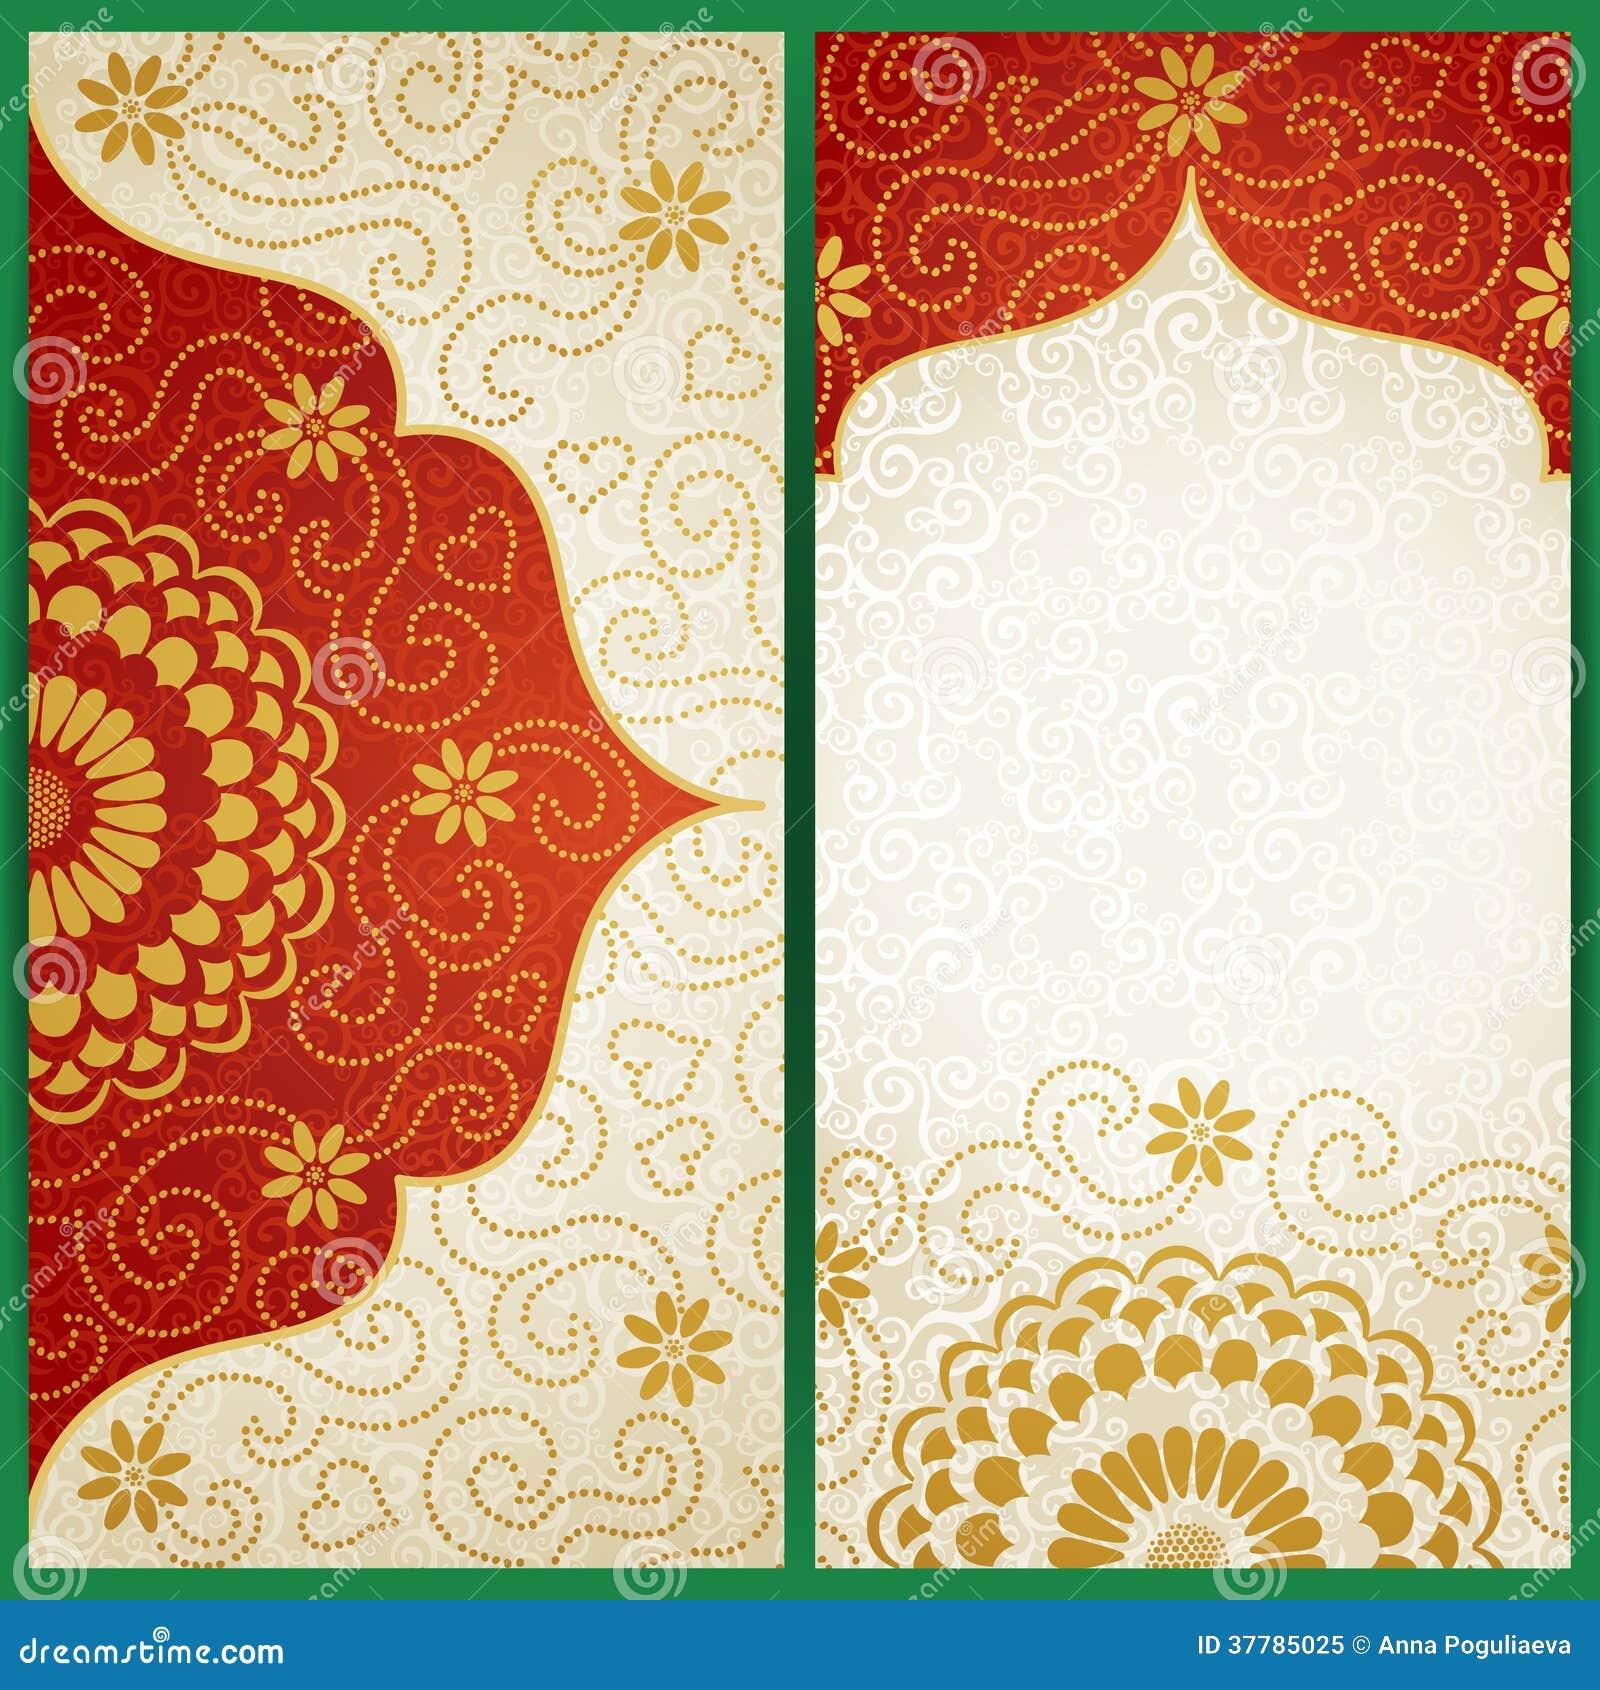 Desain Pernikahan Muslim Wedding Invitation Background Hd